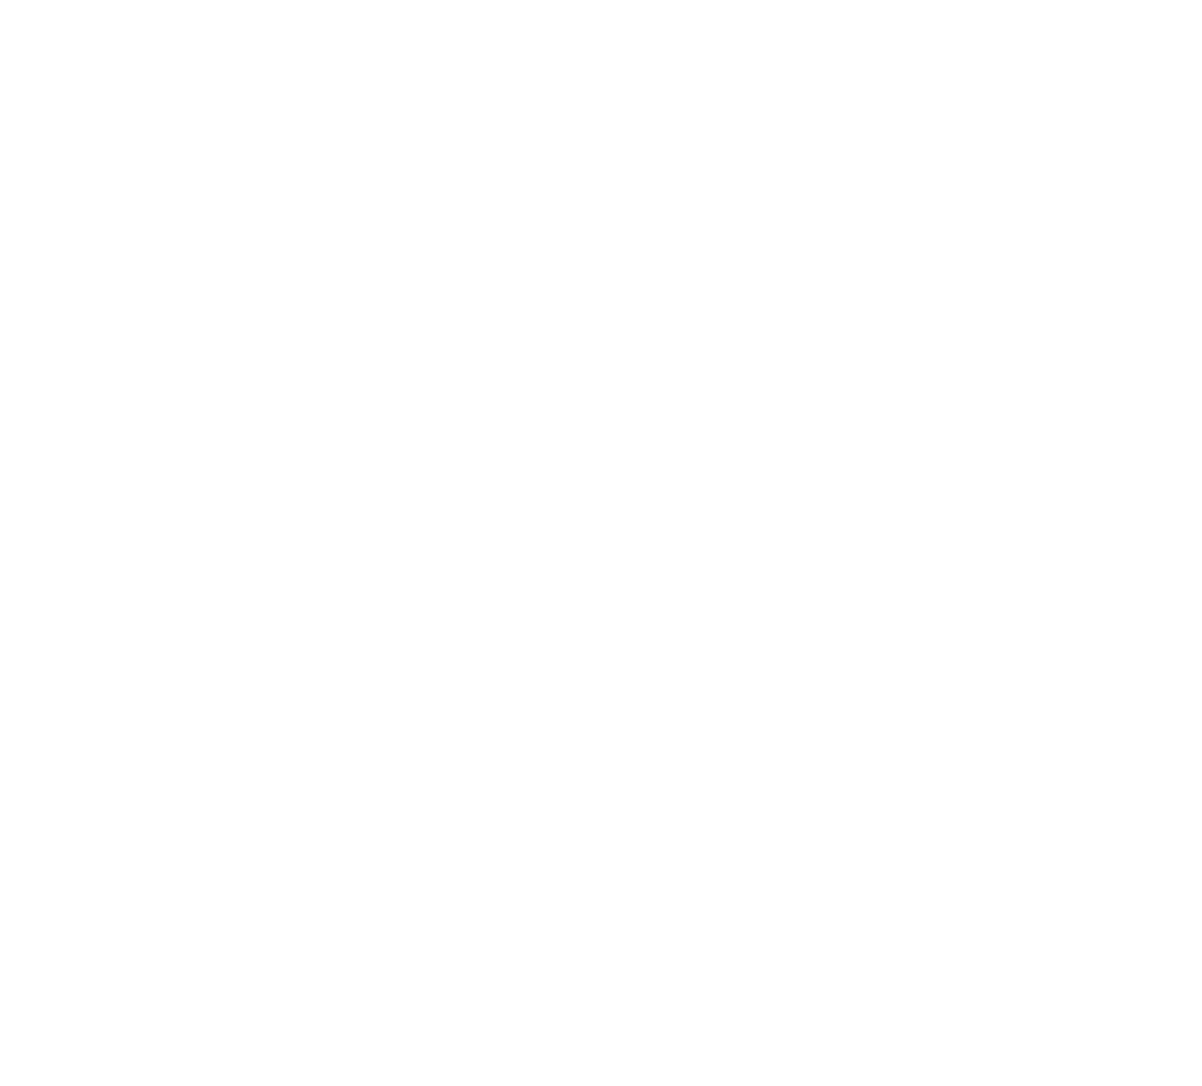 ecclesian